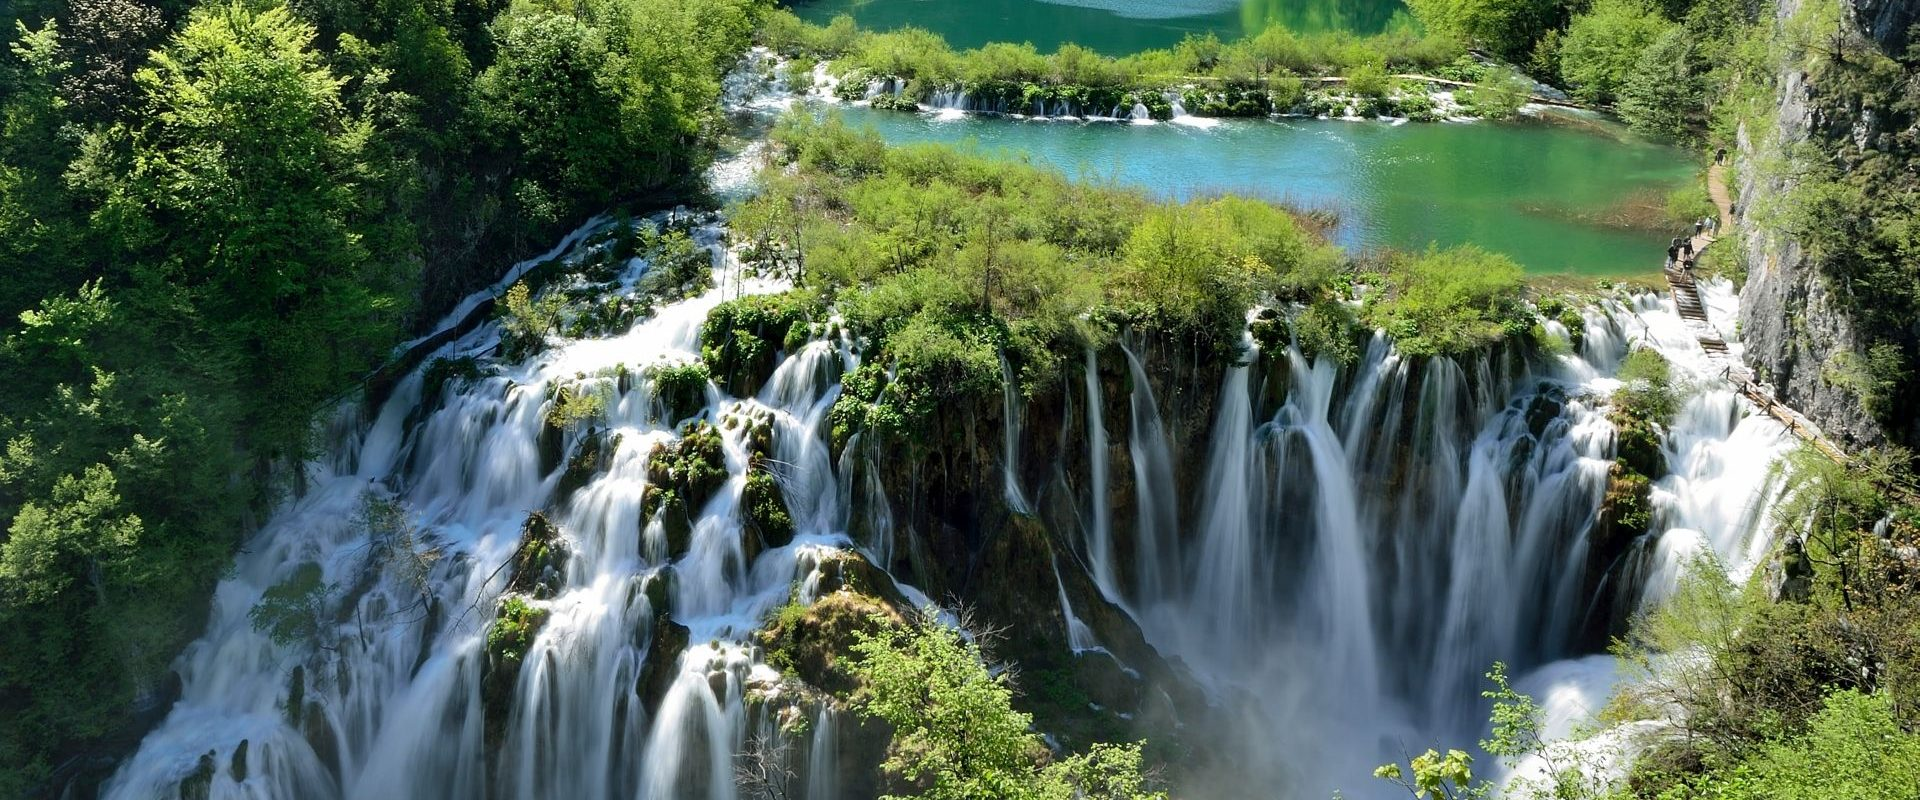 Hit Dalmatia - Best of Croatia 7 days - Plitvice Lakes